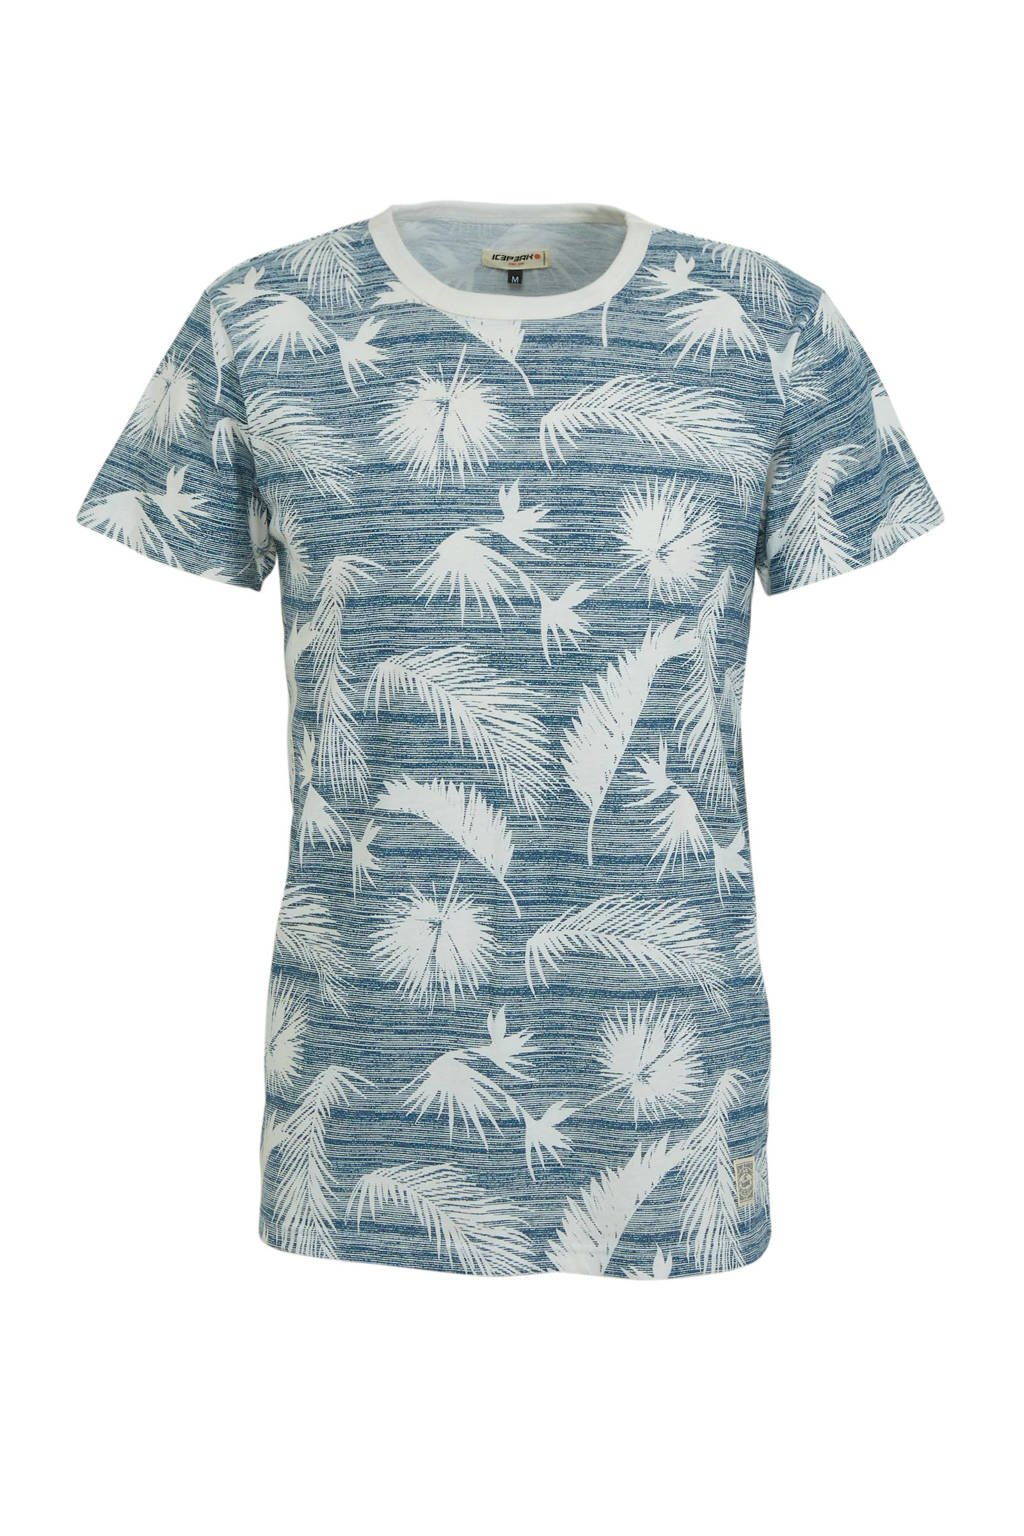 Icepeak outdoor T-shirt Mazon blauw/wit, Blauw/wit